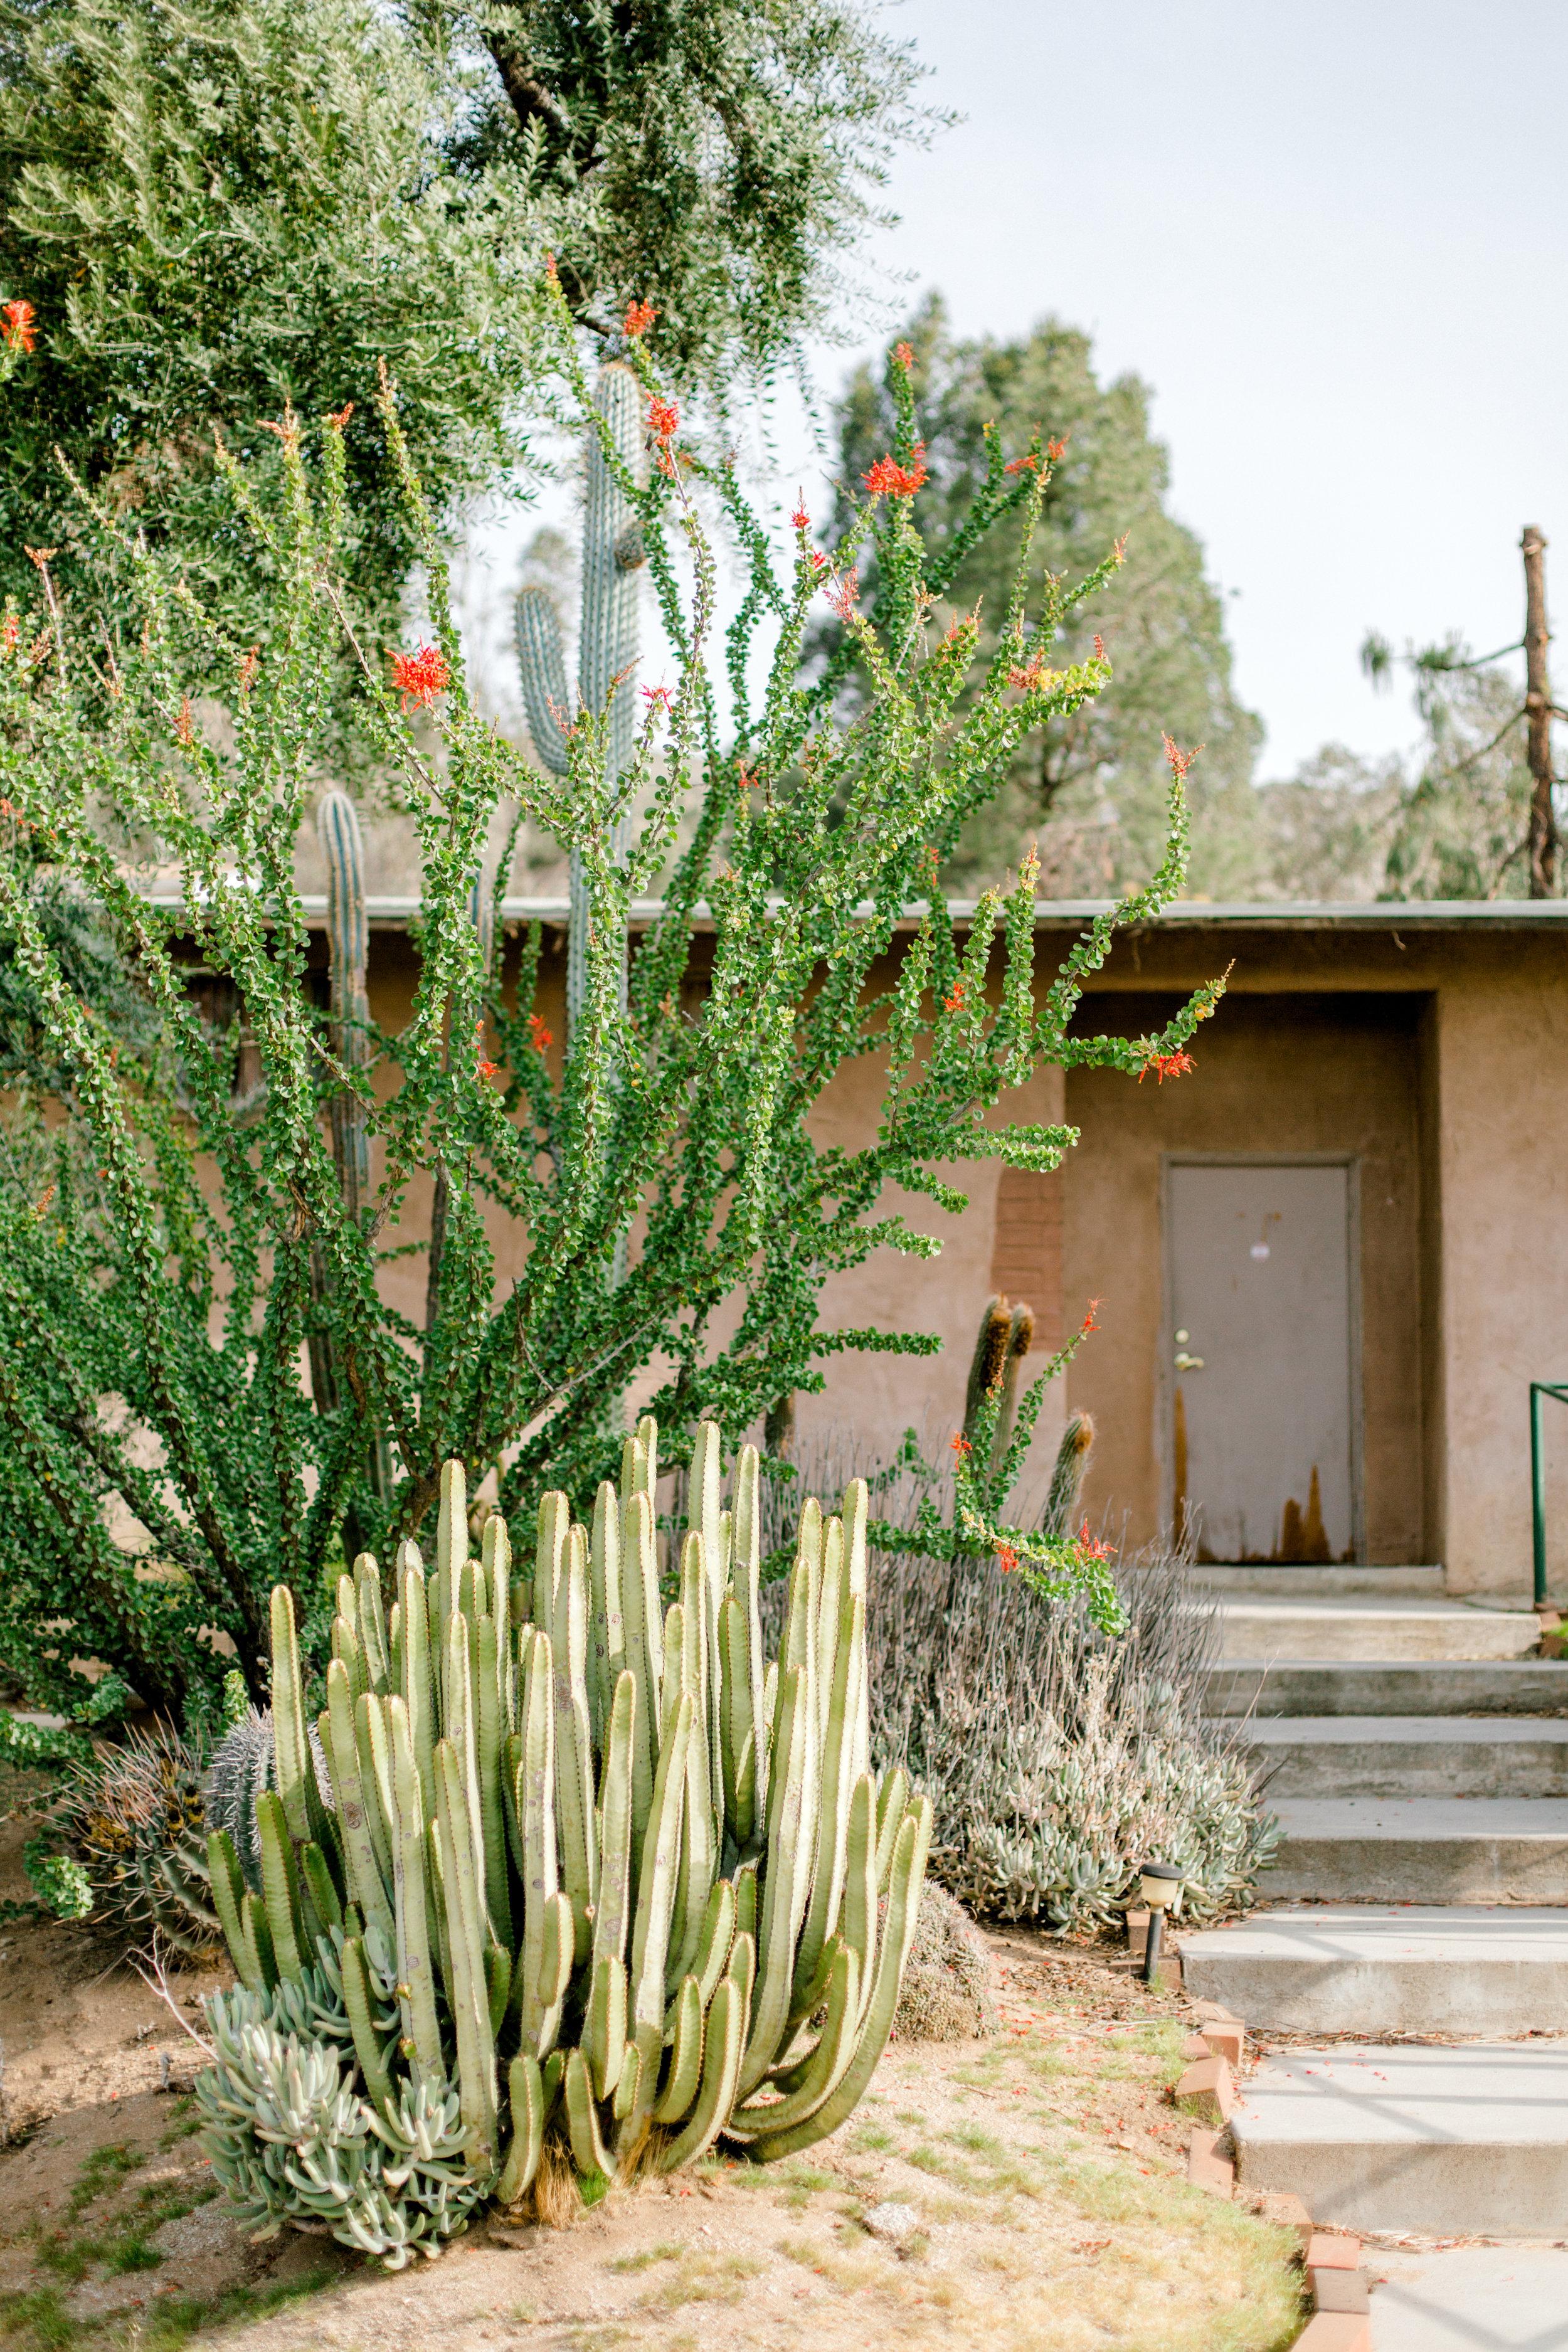 Jessica Sgubin Photography Atlanta Portrait photographer los angeles la salvation mountain greenhouse cactus garden moorten botanical garden cabazon dinosaurs santa monica joshua tree-8.jpg